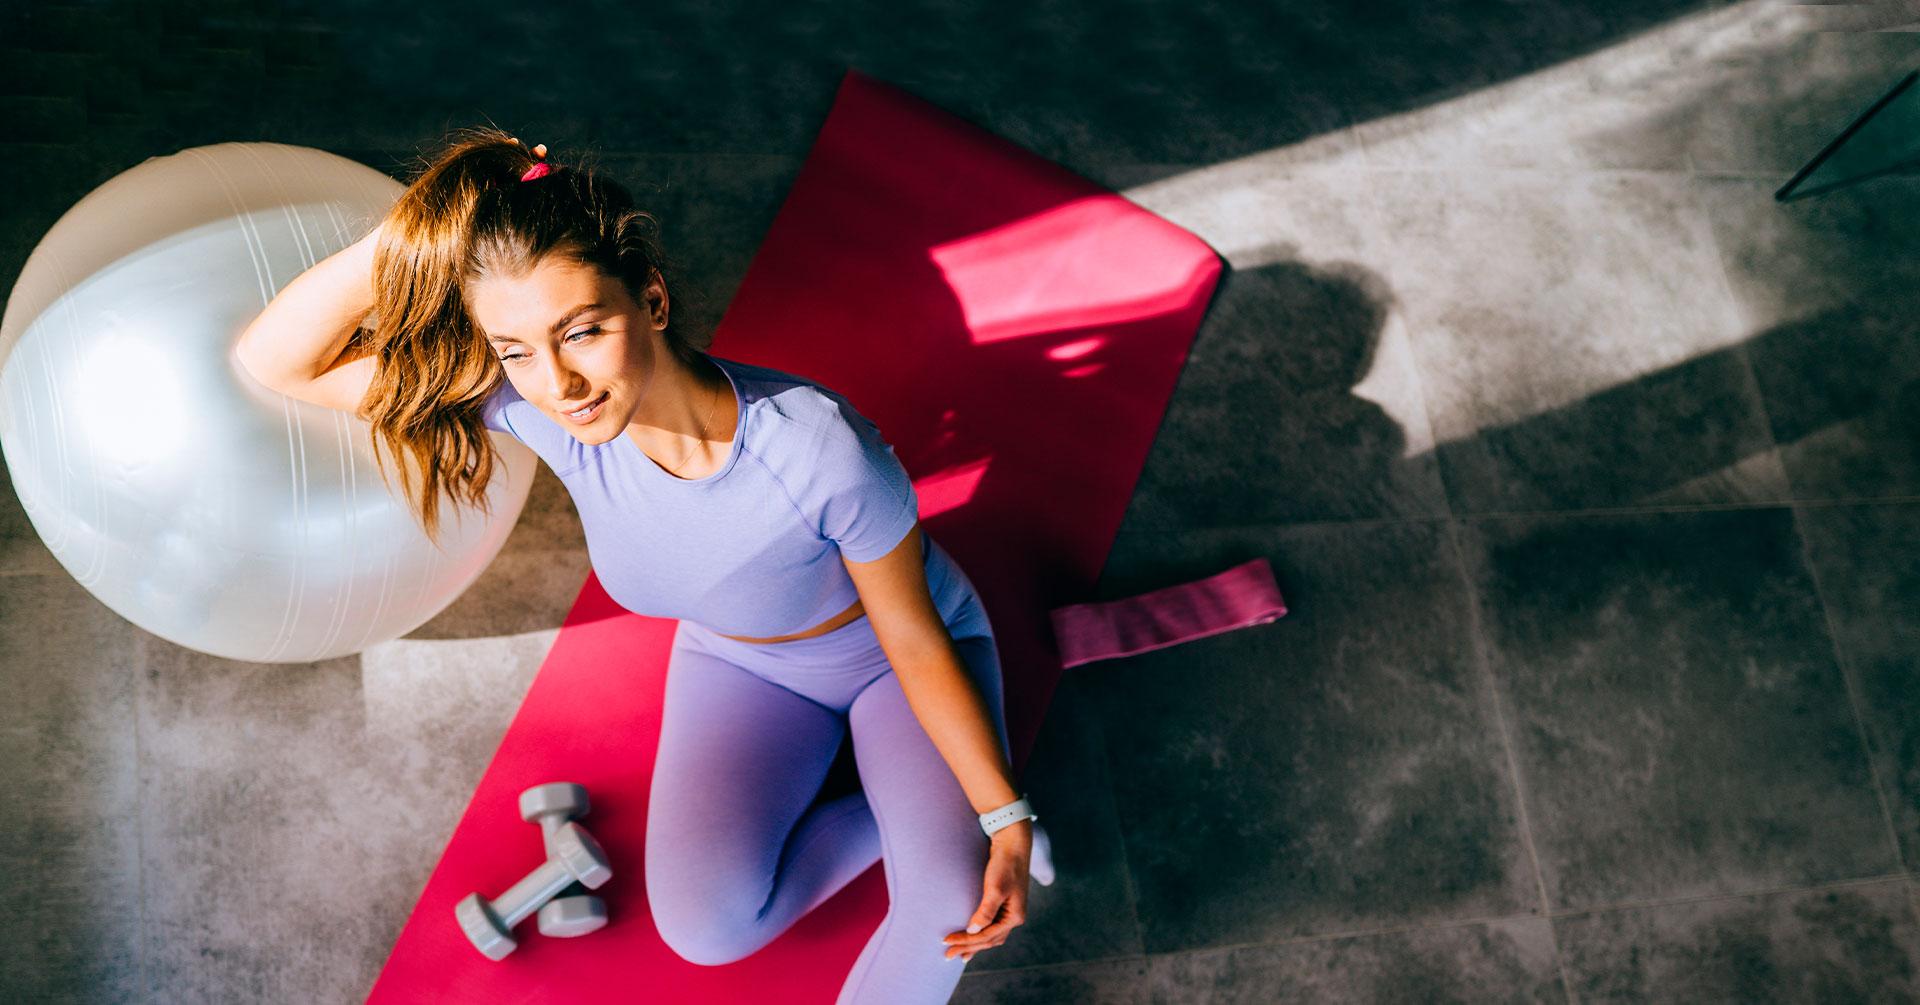 Intenta esta rutina de ejercicios con pelota en casa, ¡te encantará!